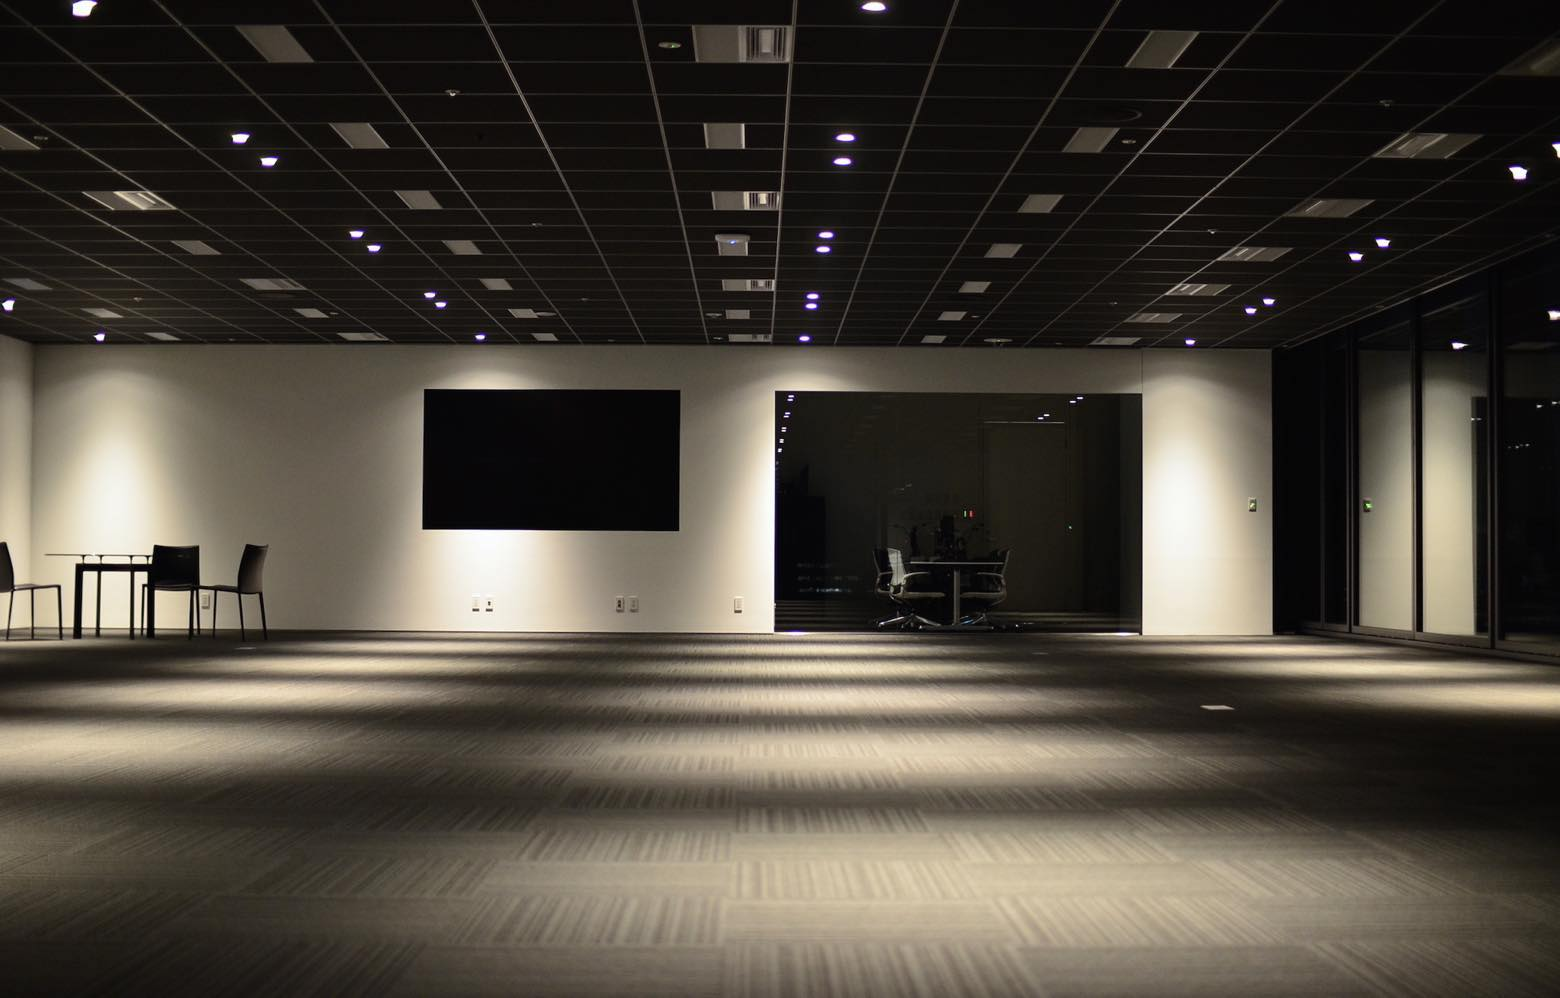 NHN テコラス株式会社 Entrance Lounge デザイン・レイアウト事例